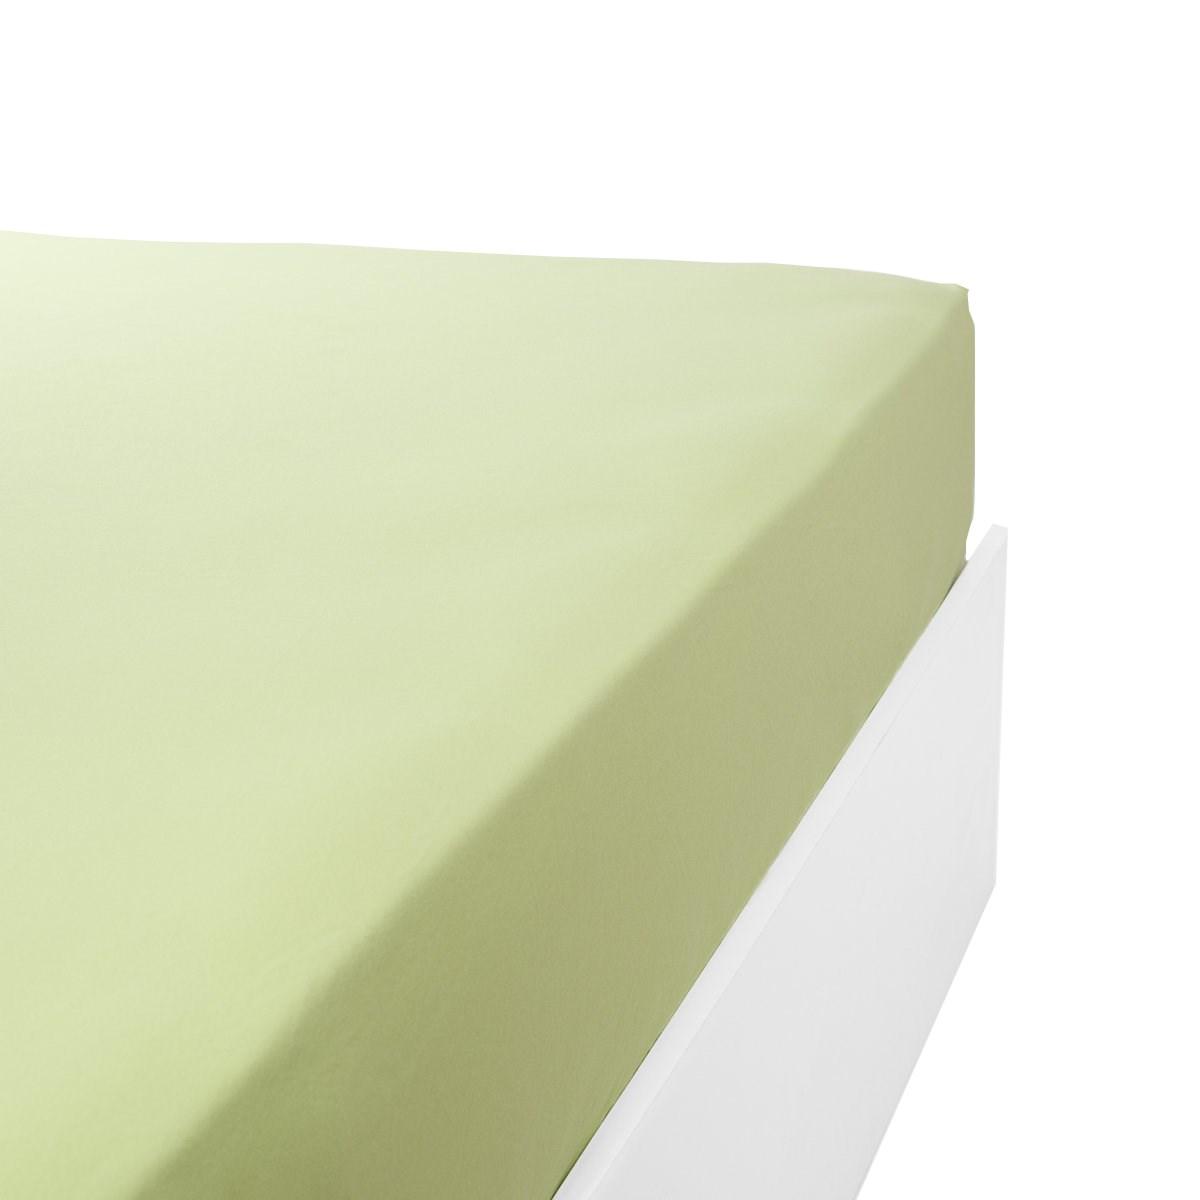 Drap housse flanelle en Molleton Vert anis 200x200 cm